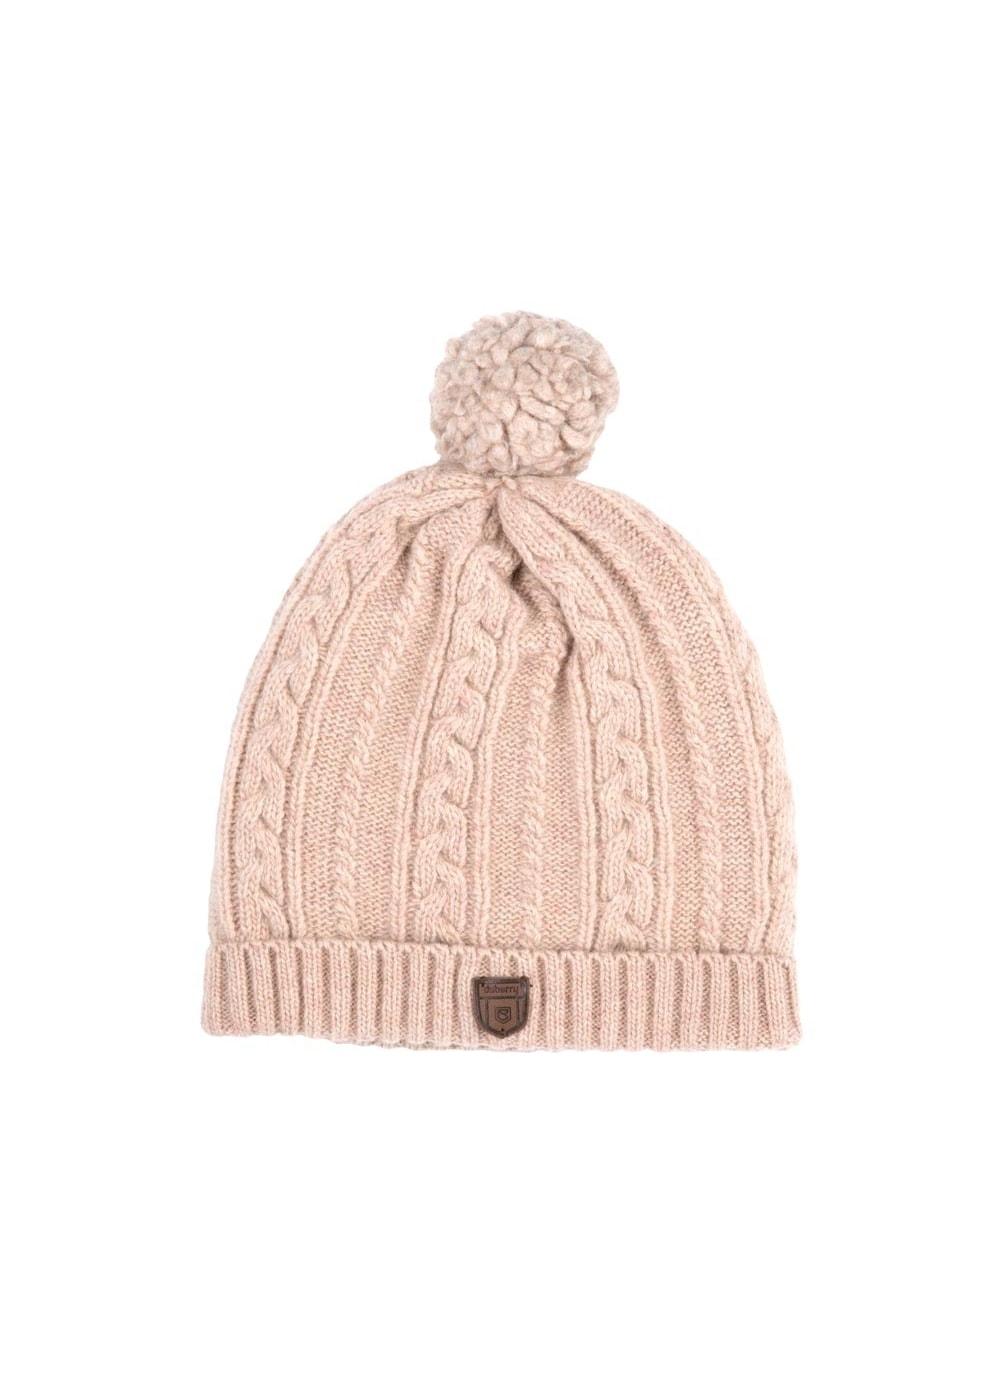 Dubarry Keadue Bobble Hat - Ladies from A Hume UK 735d8d9d37b6